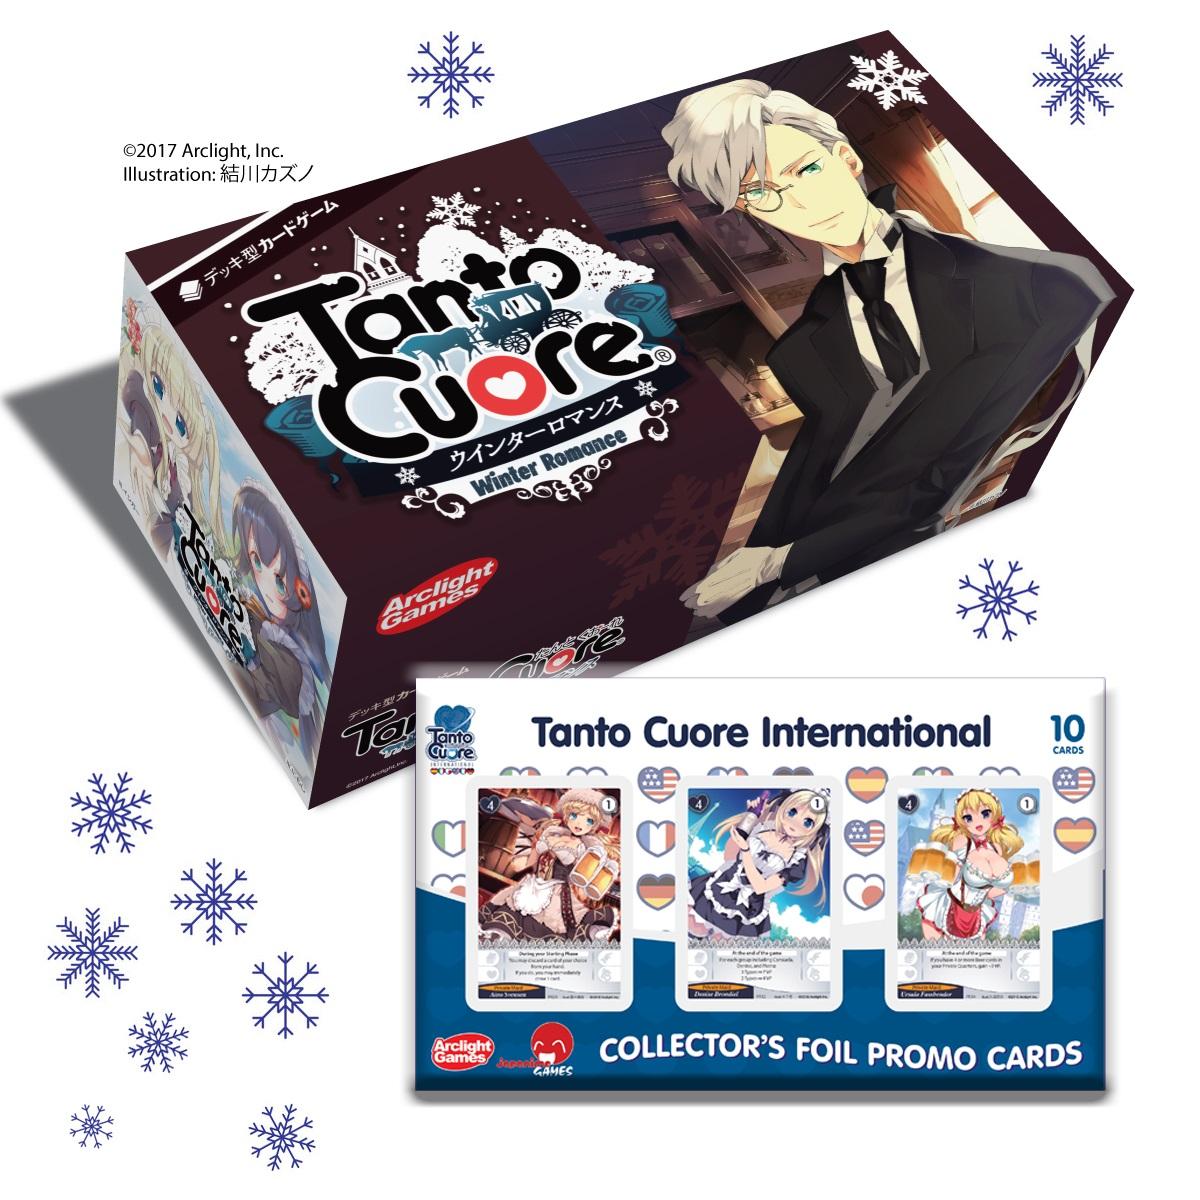 The Tanto Cuore Winter Romance Bundle